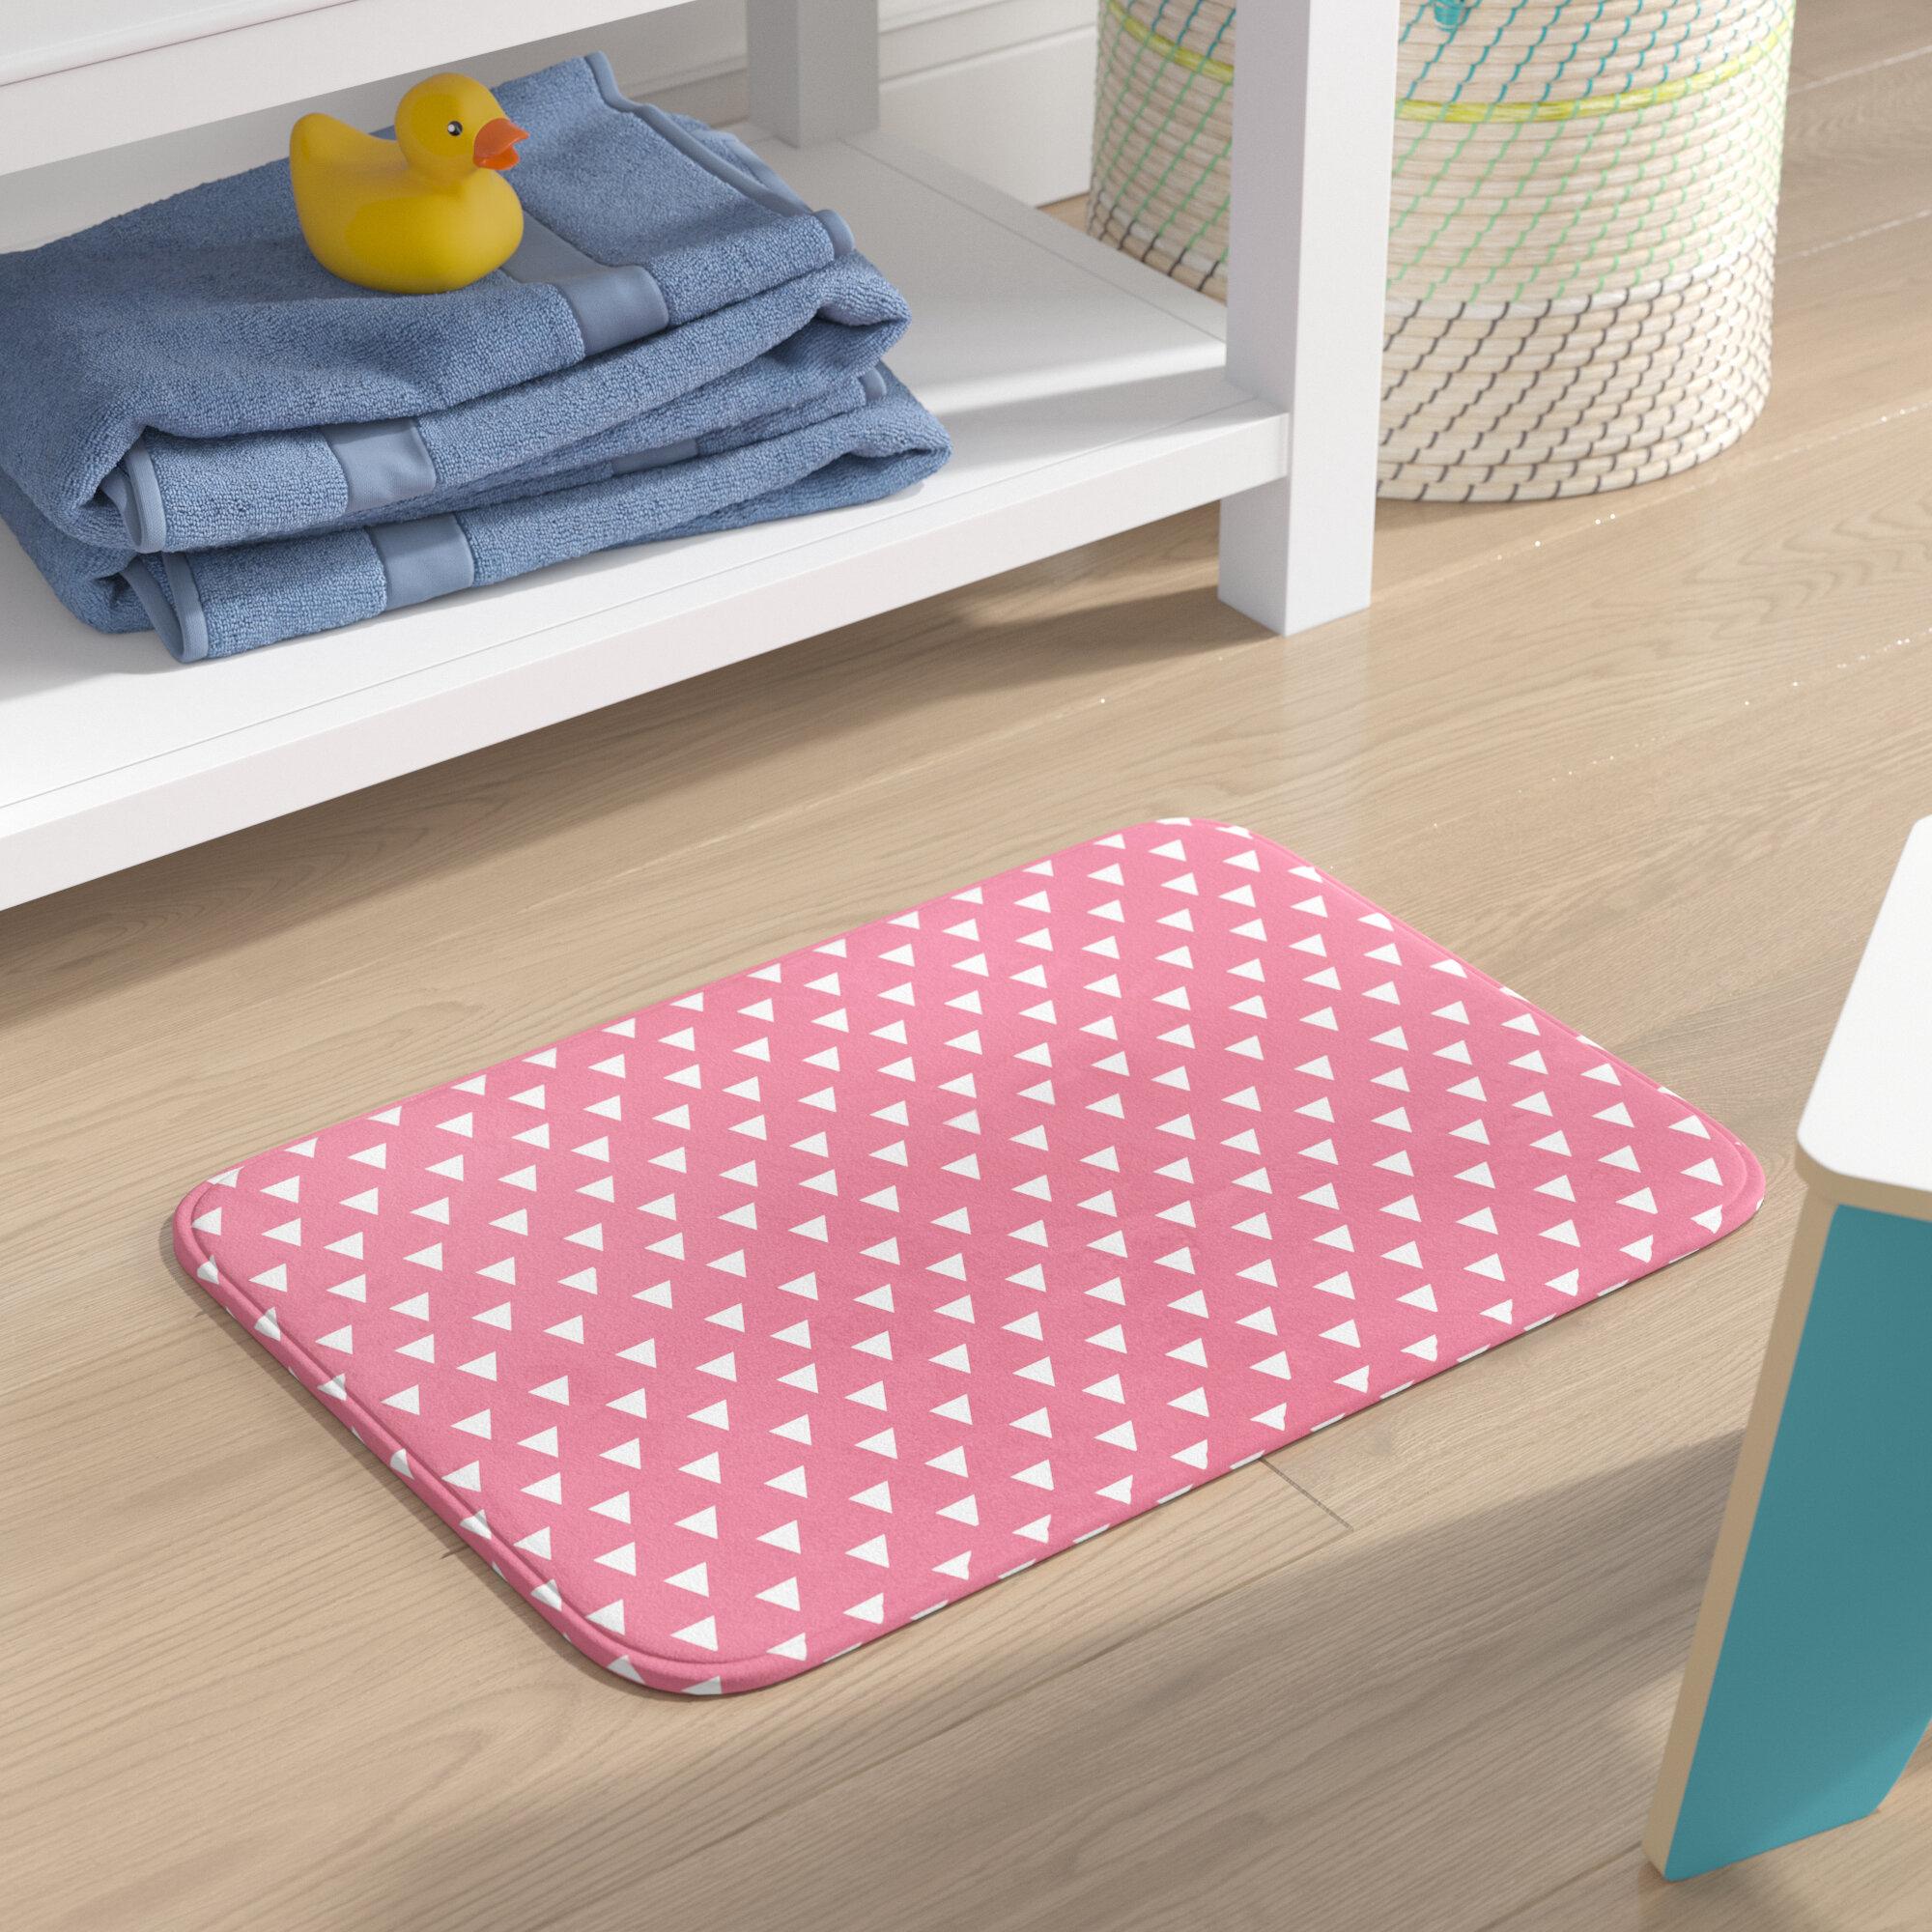 Geometric Pink Bath Rugs Mats You Ll Love In 2021 Wayfair